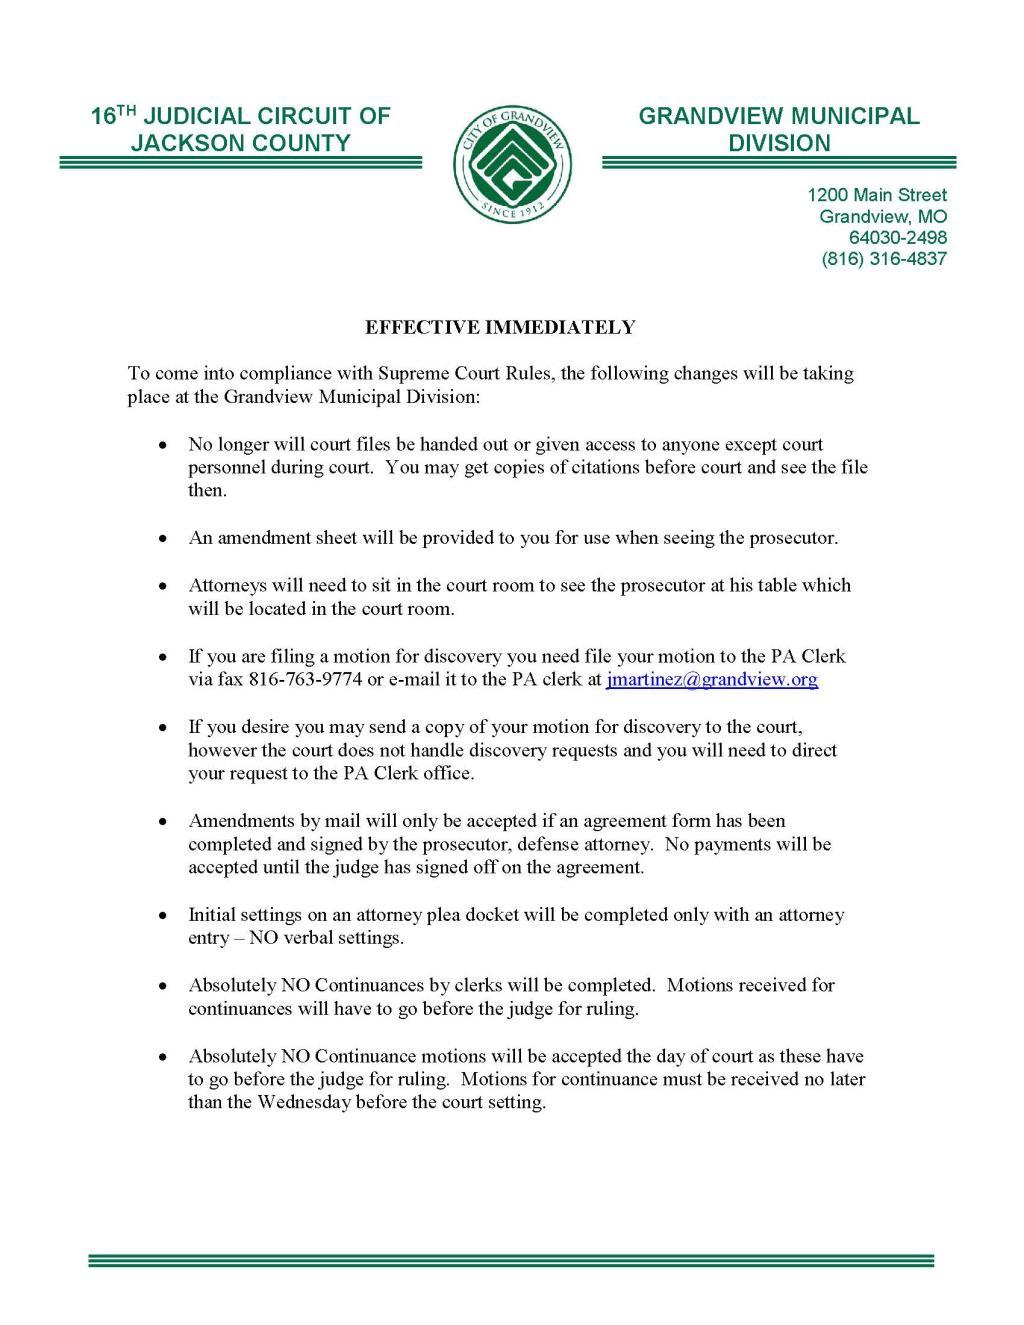 Court Forms | Grandview, MO